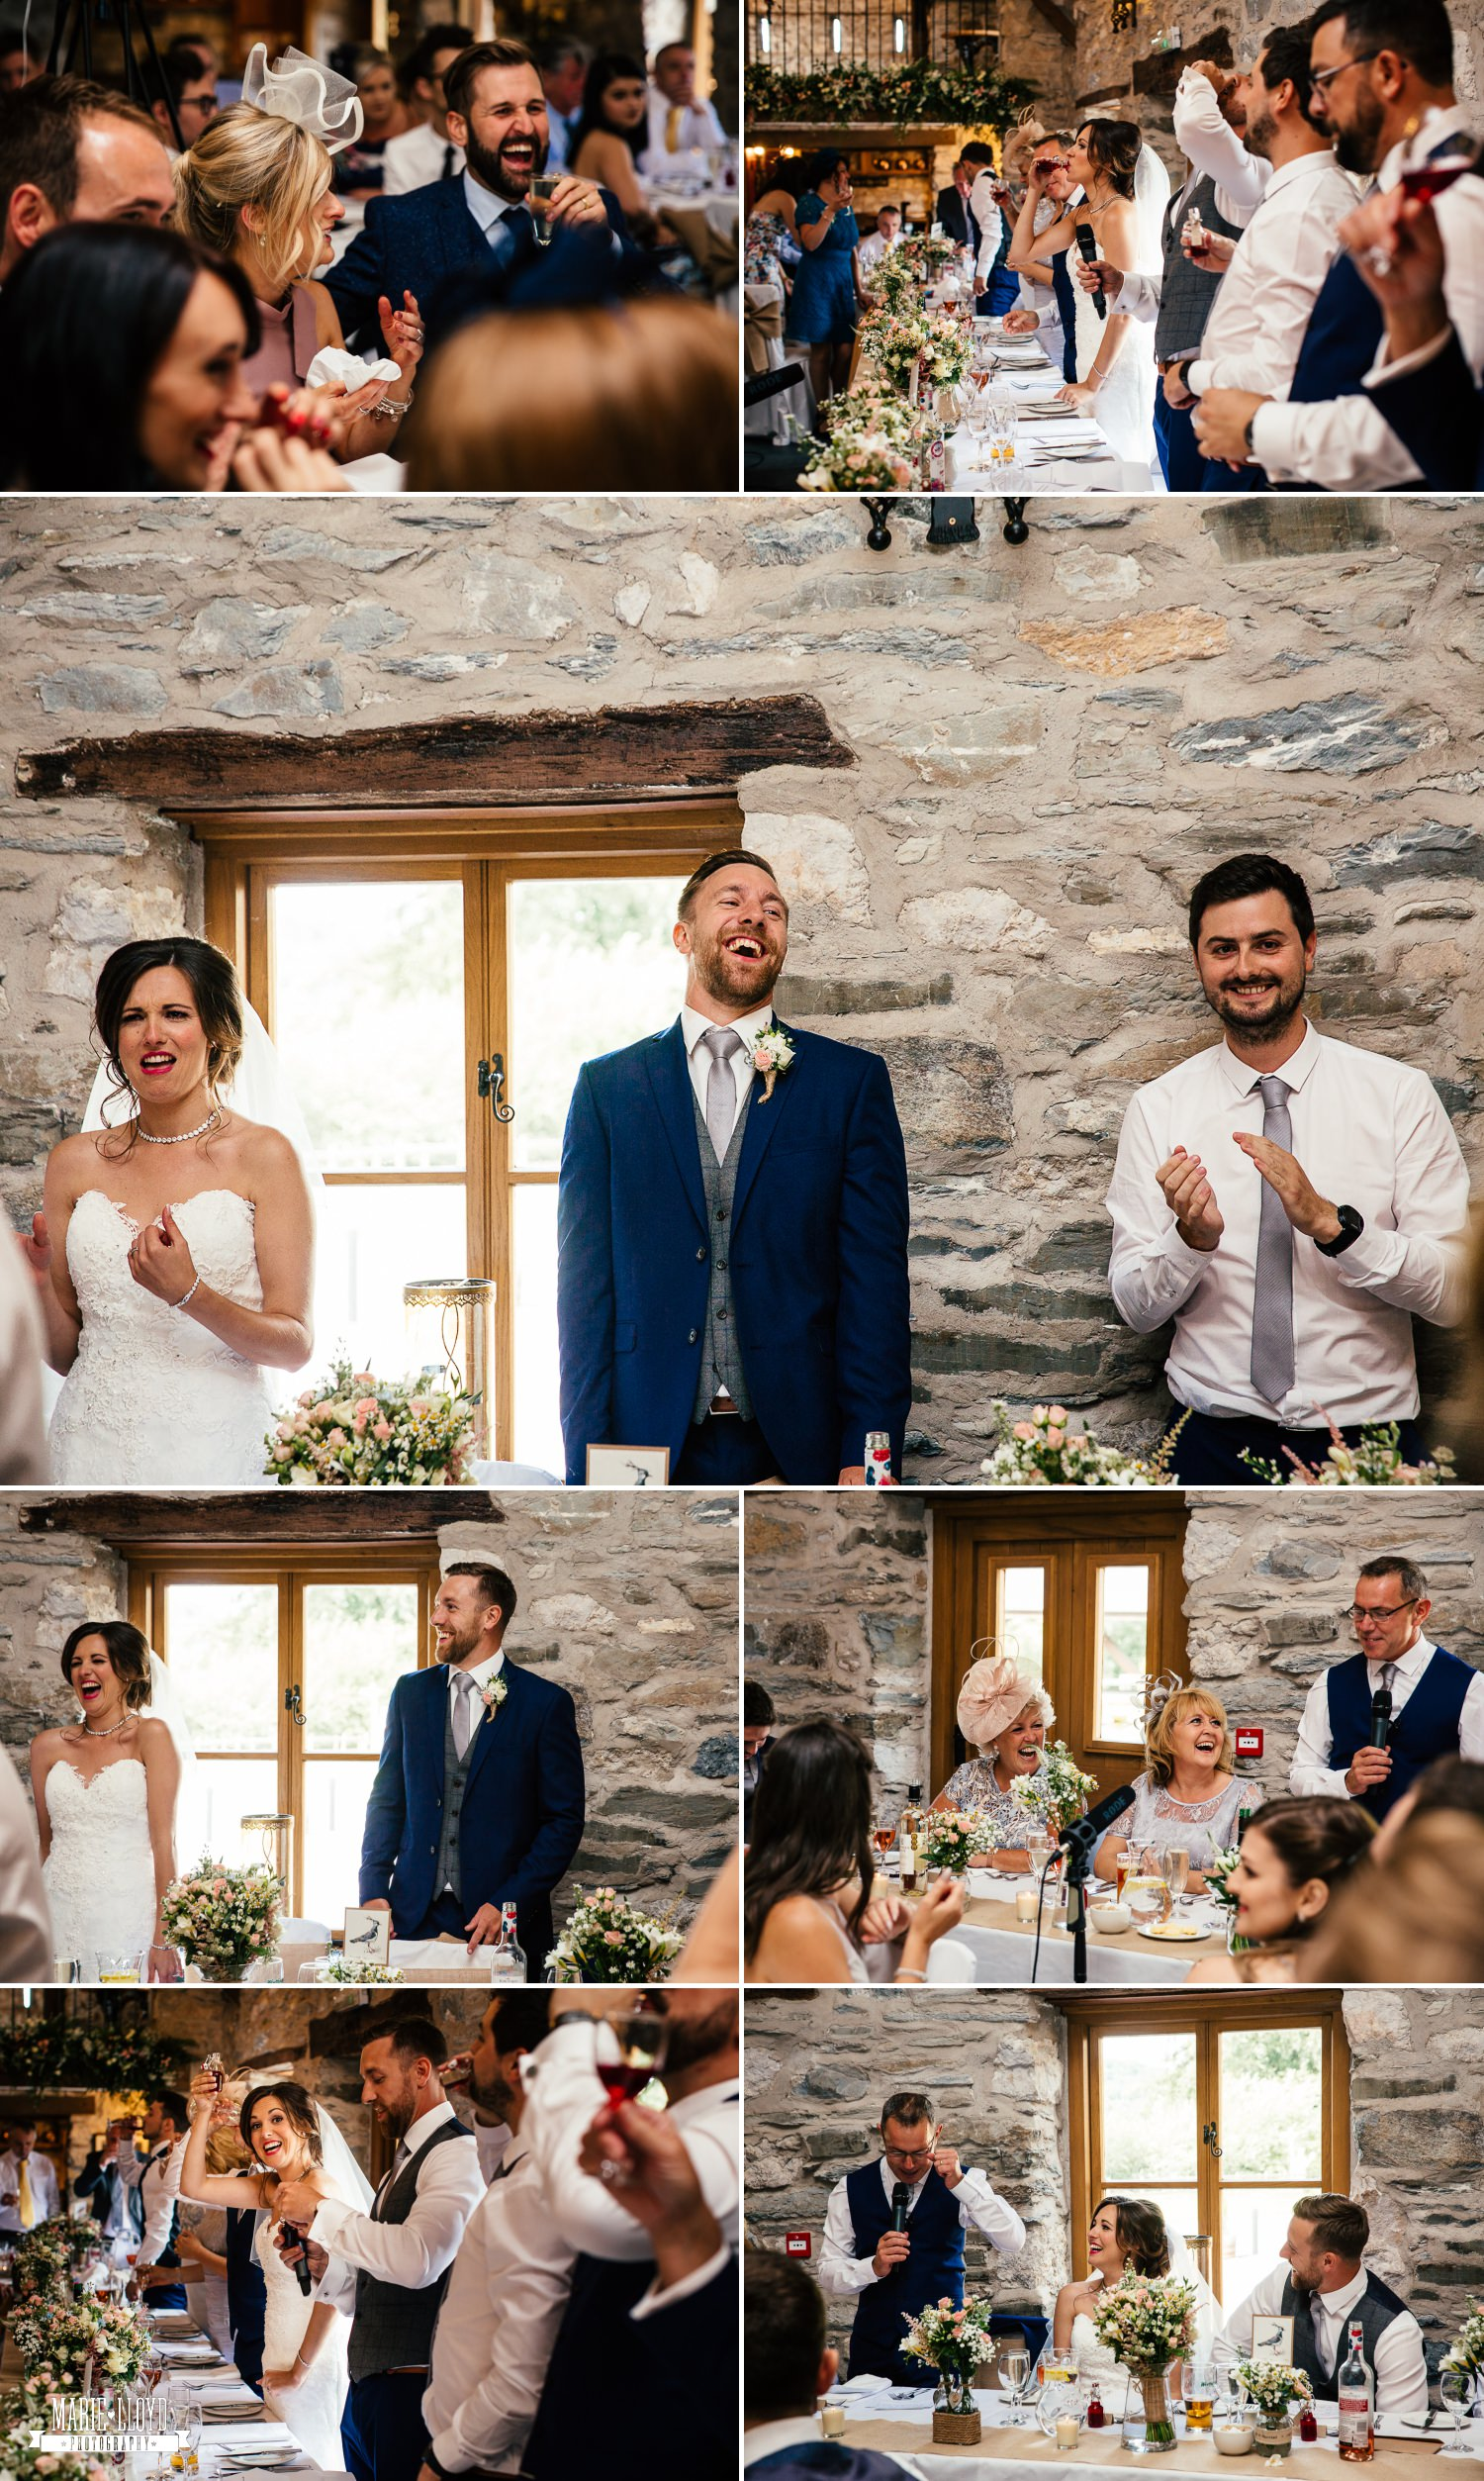 Wedding Photography at Plas Isaf, North Wales